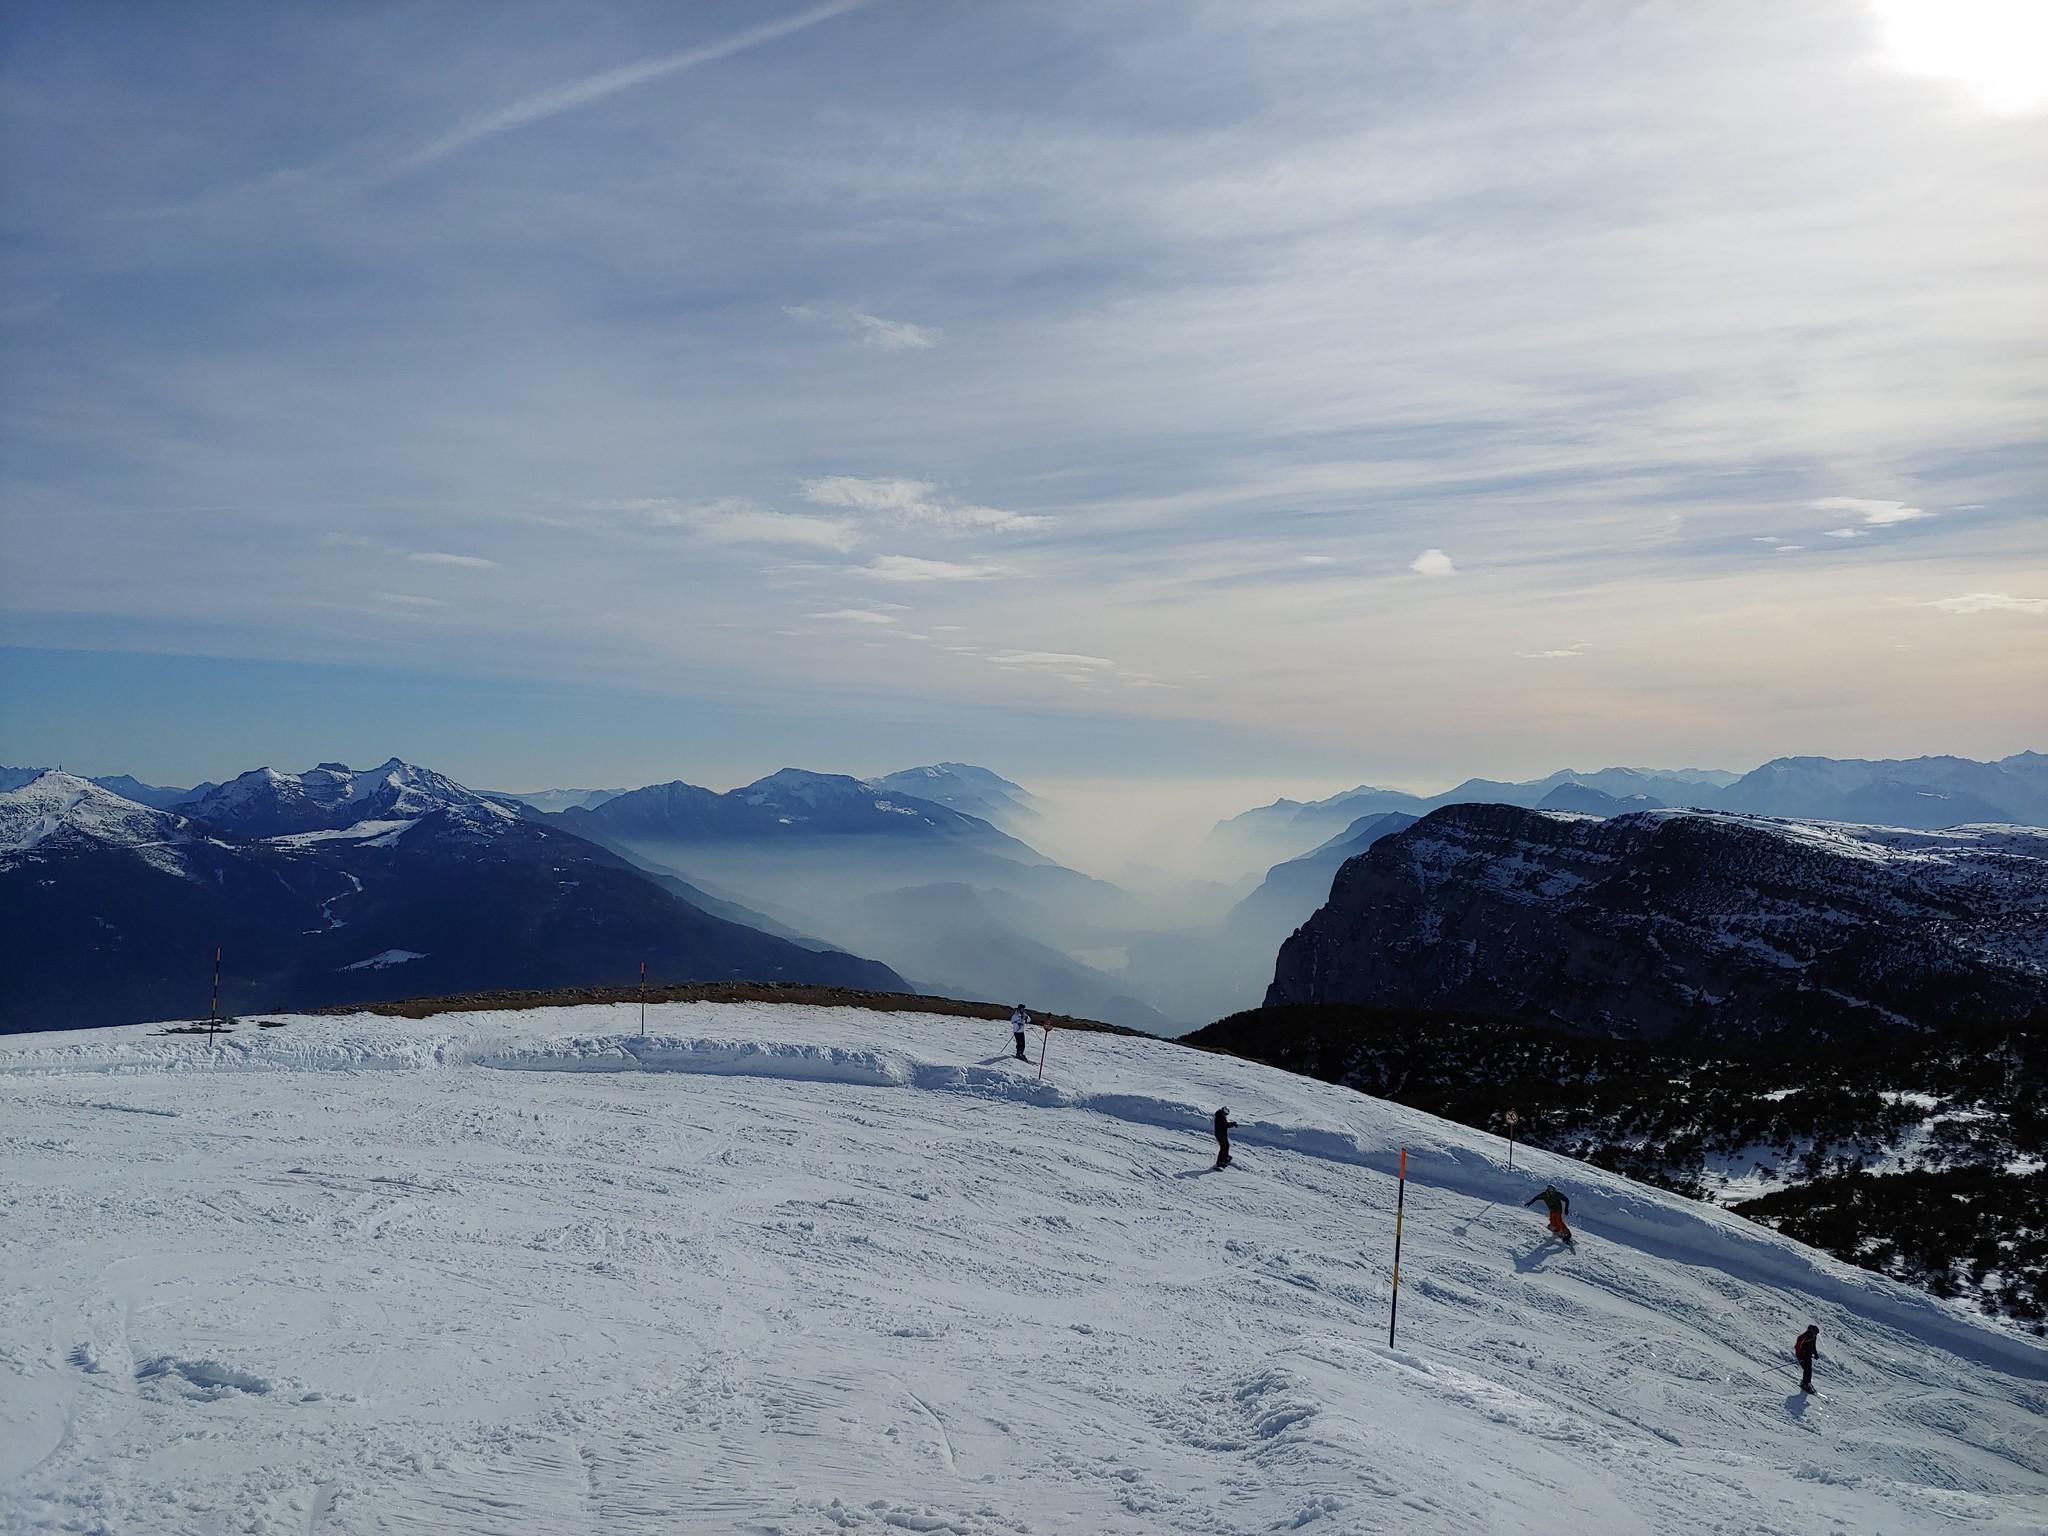 piste da sci in trentino alto adige andalo